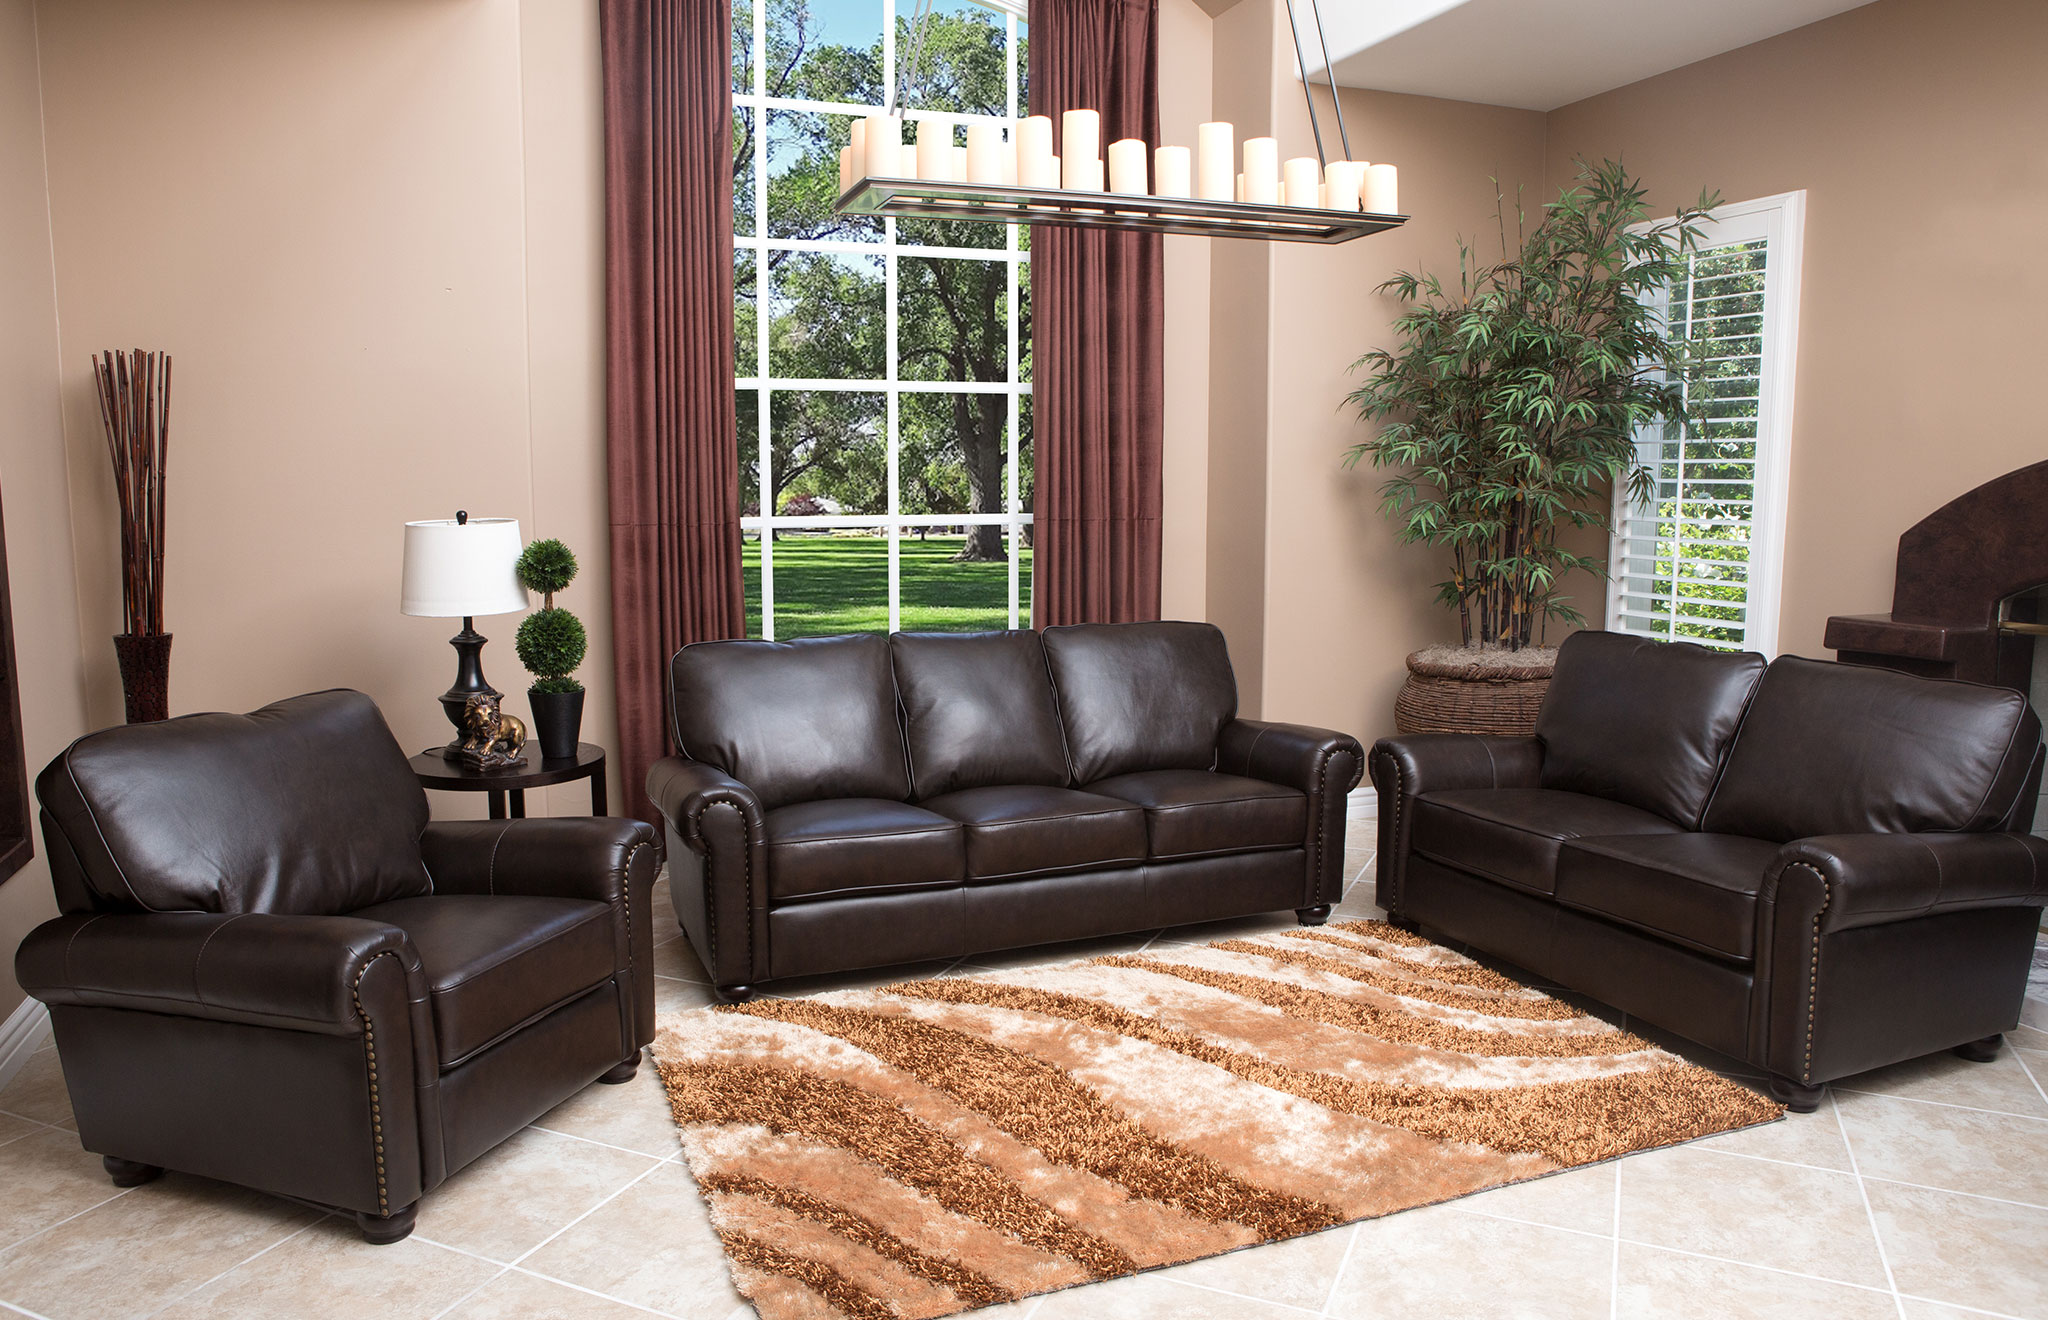 abbyson living berkshire italian leather sectional sofa design institute address venezia reviews amazon com